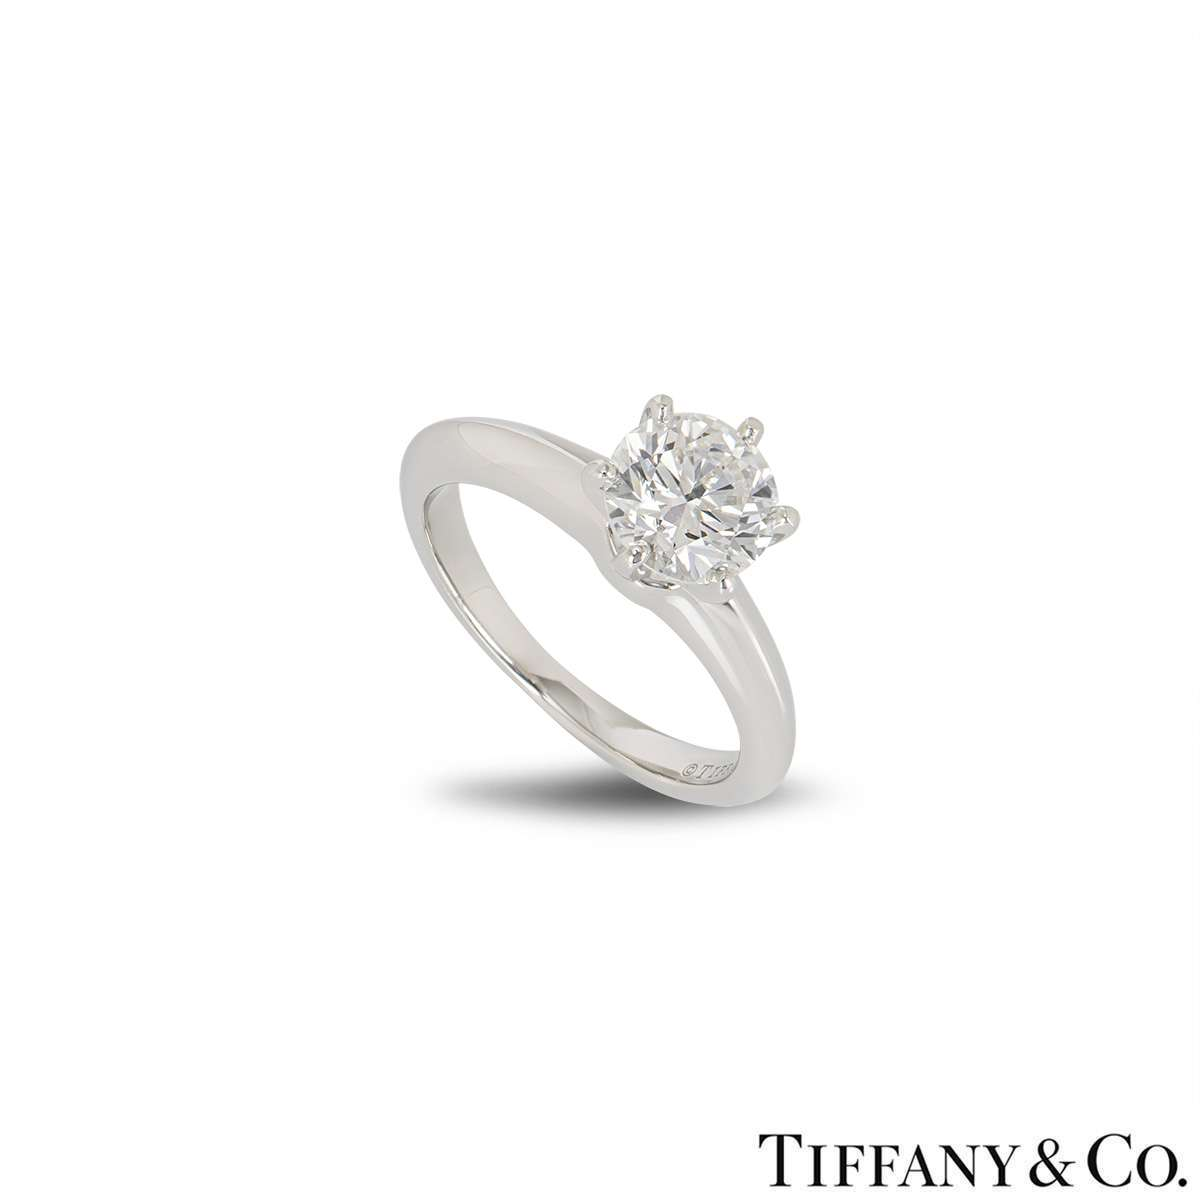 Tiffany & Co. Platinum Diamond Setting Ring 1.01ct I/VS2 XXX